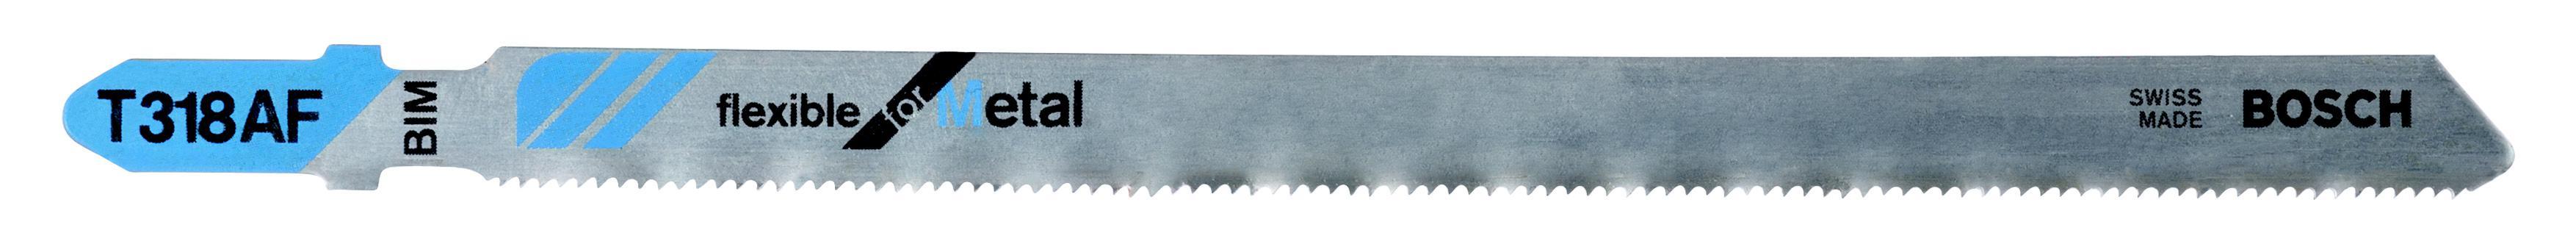 Пилки для лобзика Bosch T318af (2.608.634.241) bosch pch 615b90e в екатеринбурге